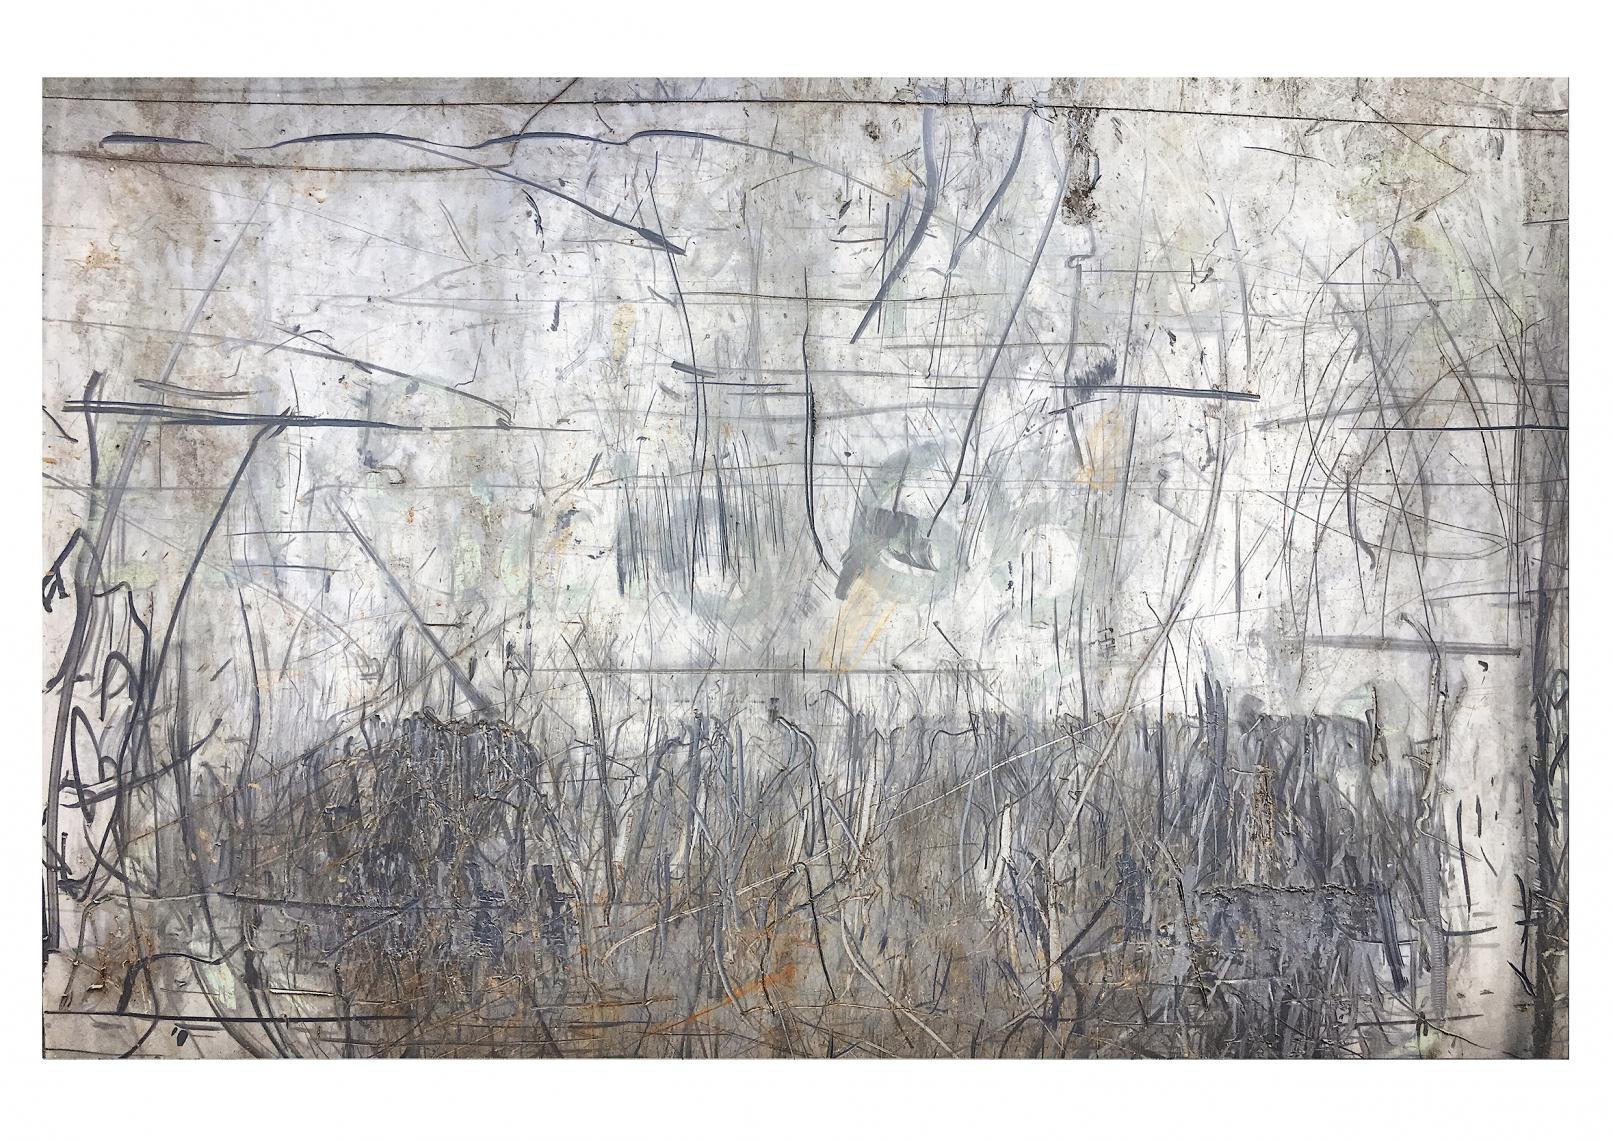 Vedado-Havana (Trash Painting VIII) (2017) - David Beltrán